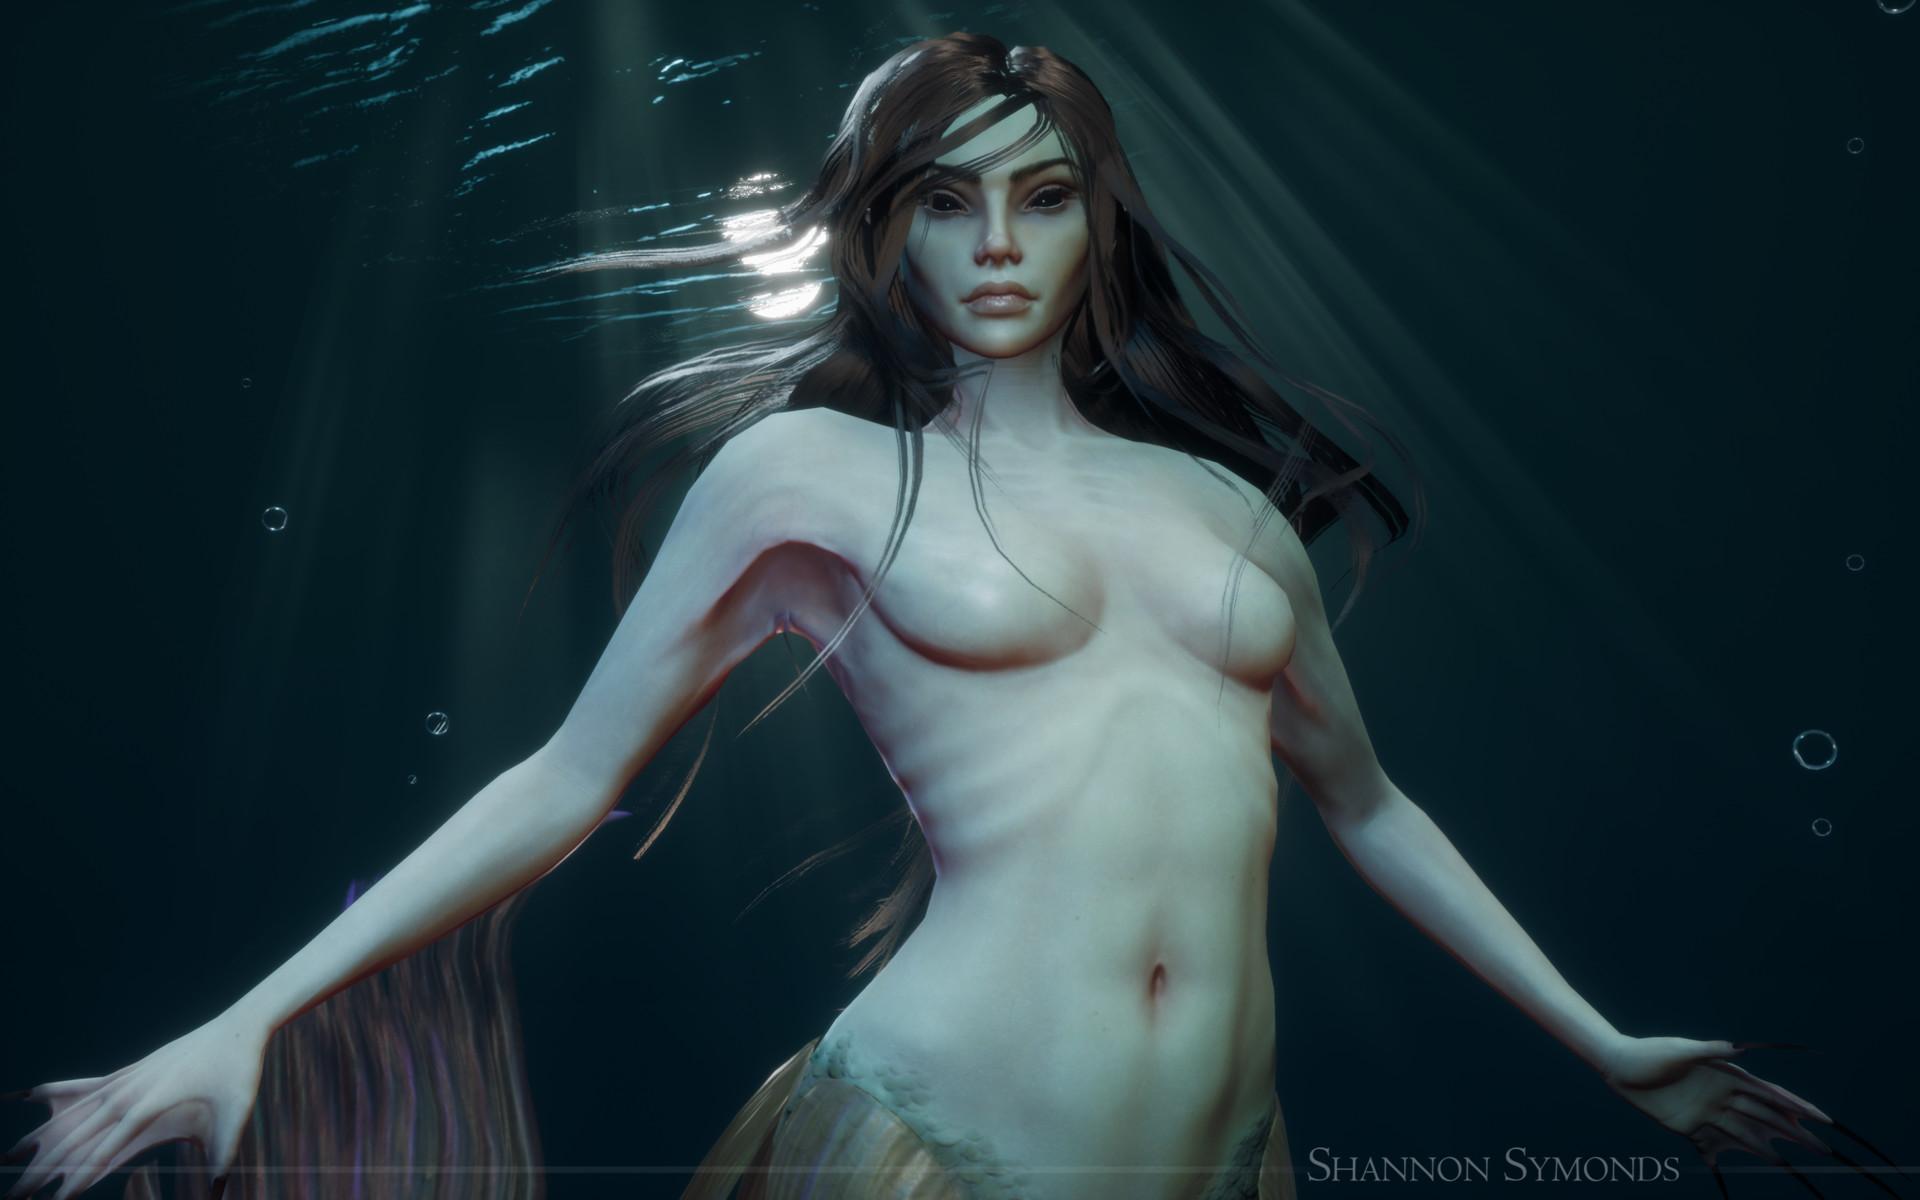 Shannon symonds close up mermaid